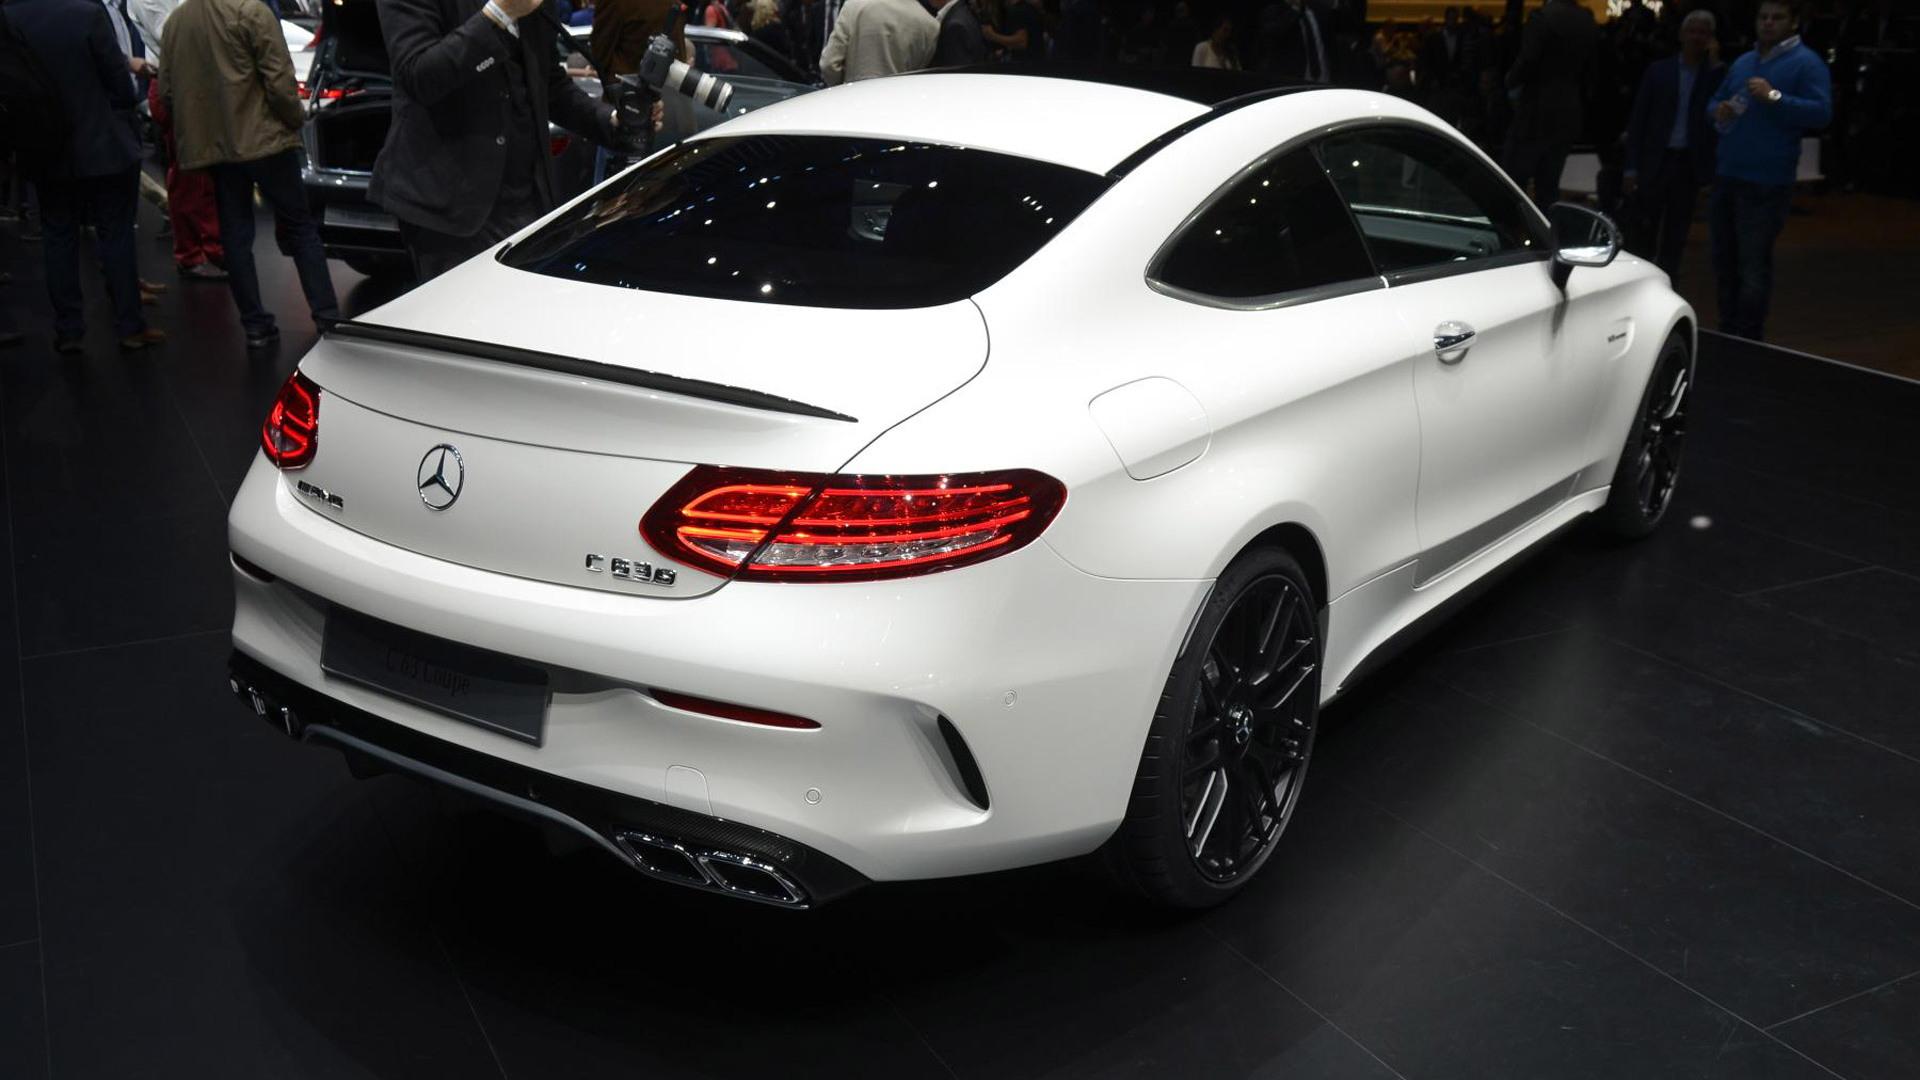 2017 Mercedes-AMG C63 Coupe, 2015 Frankfurt Auto Show